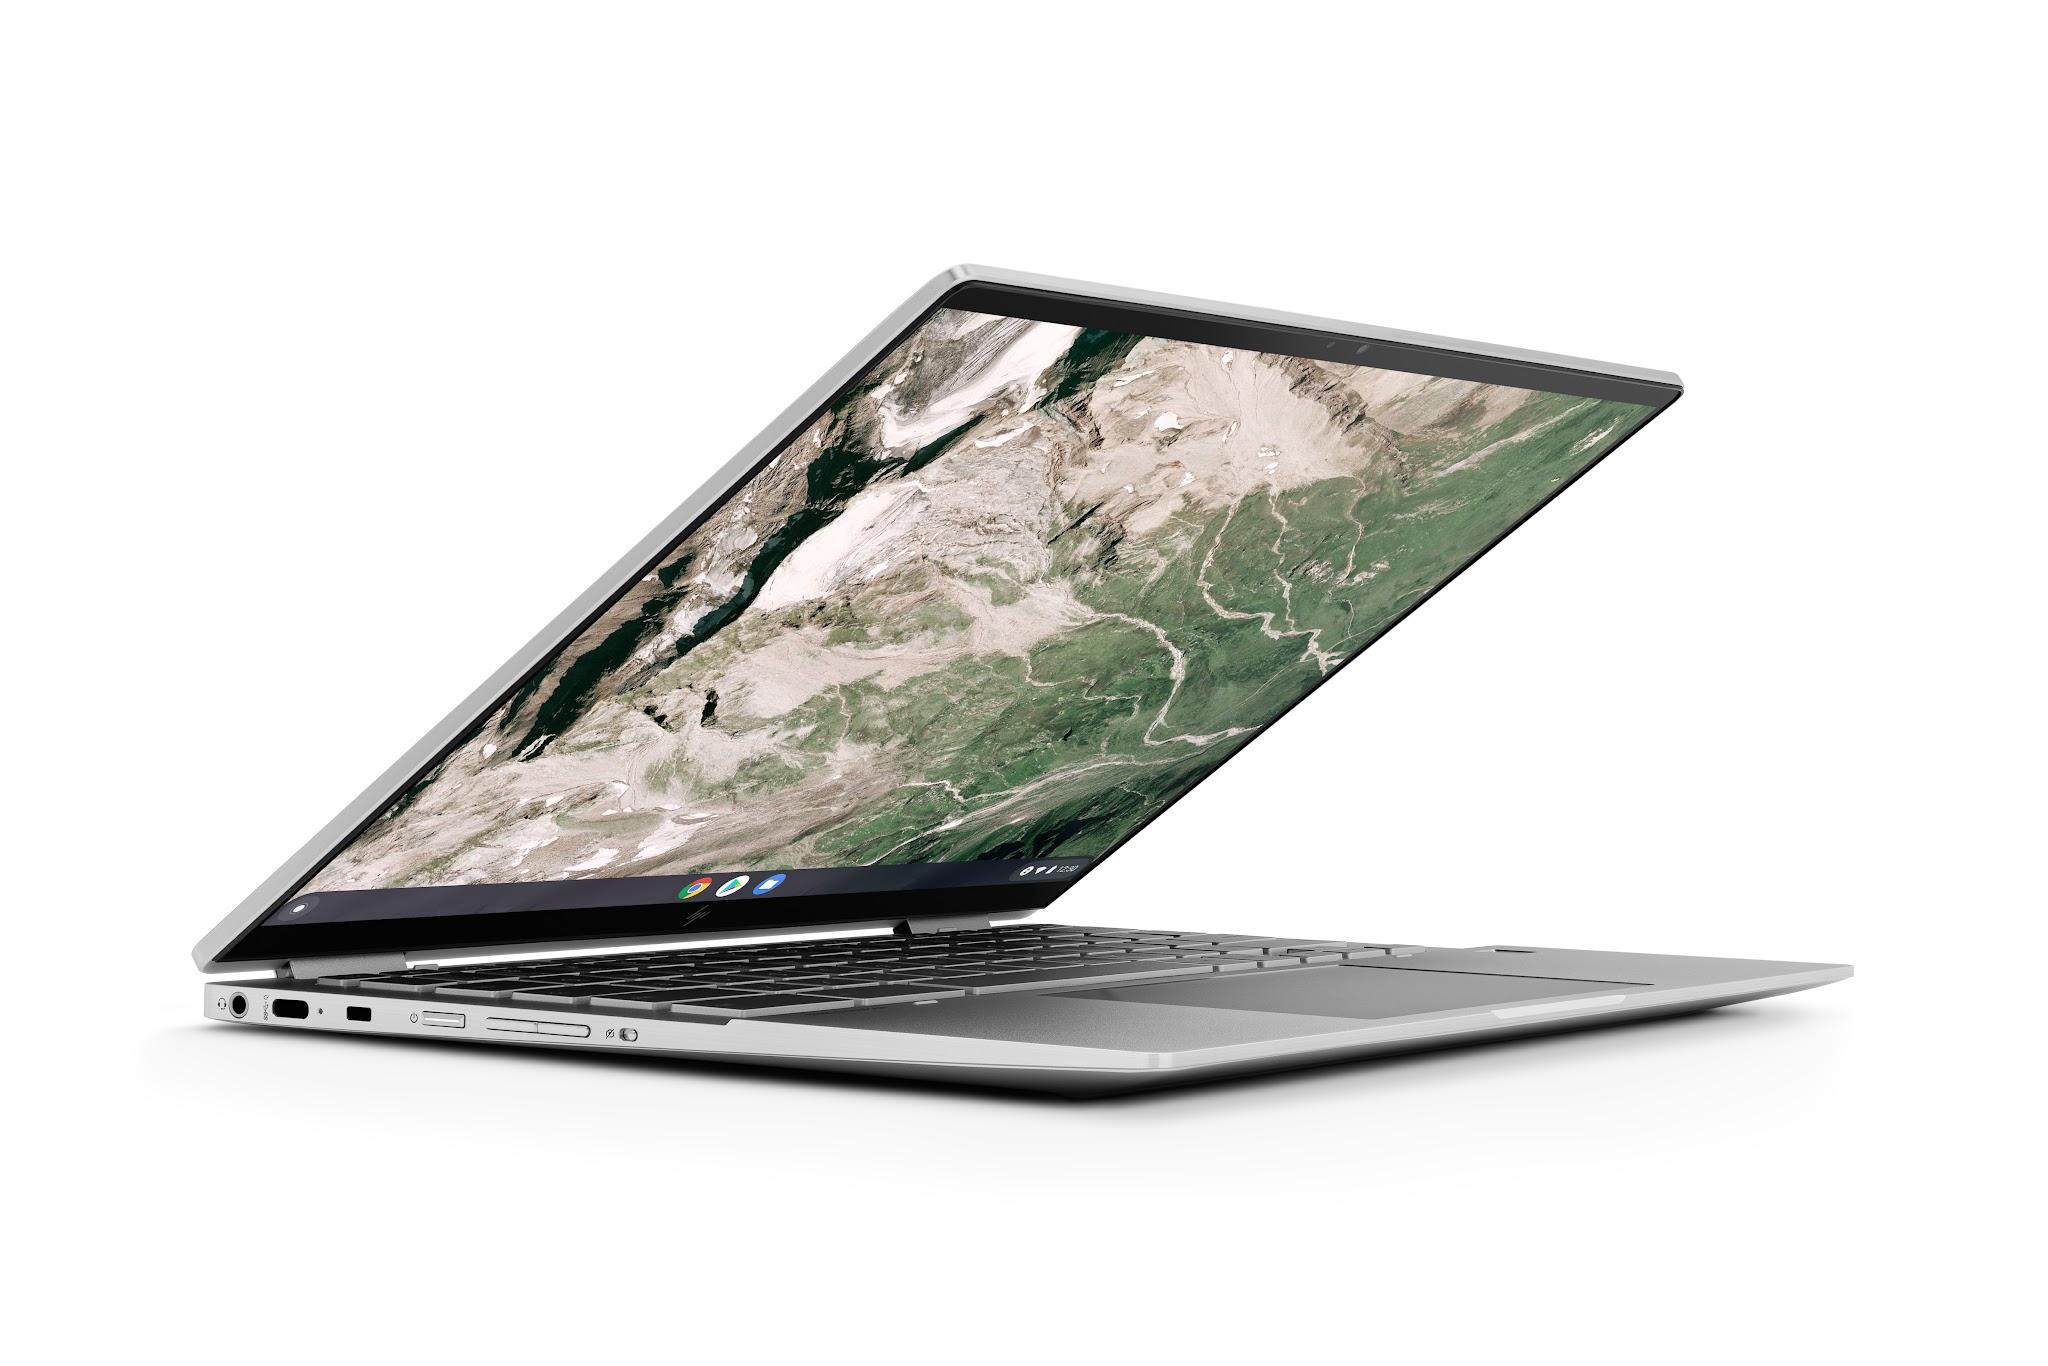 HP Chromebook x360 13c - photo 8